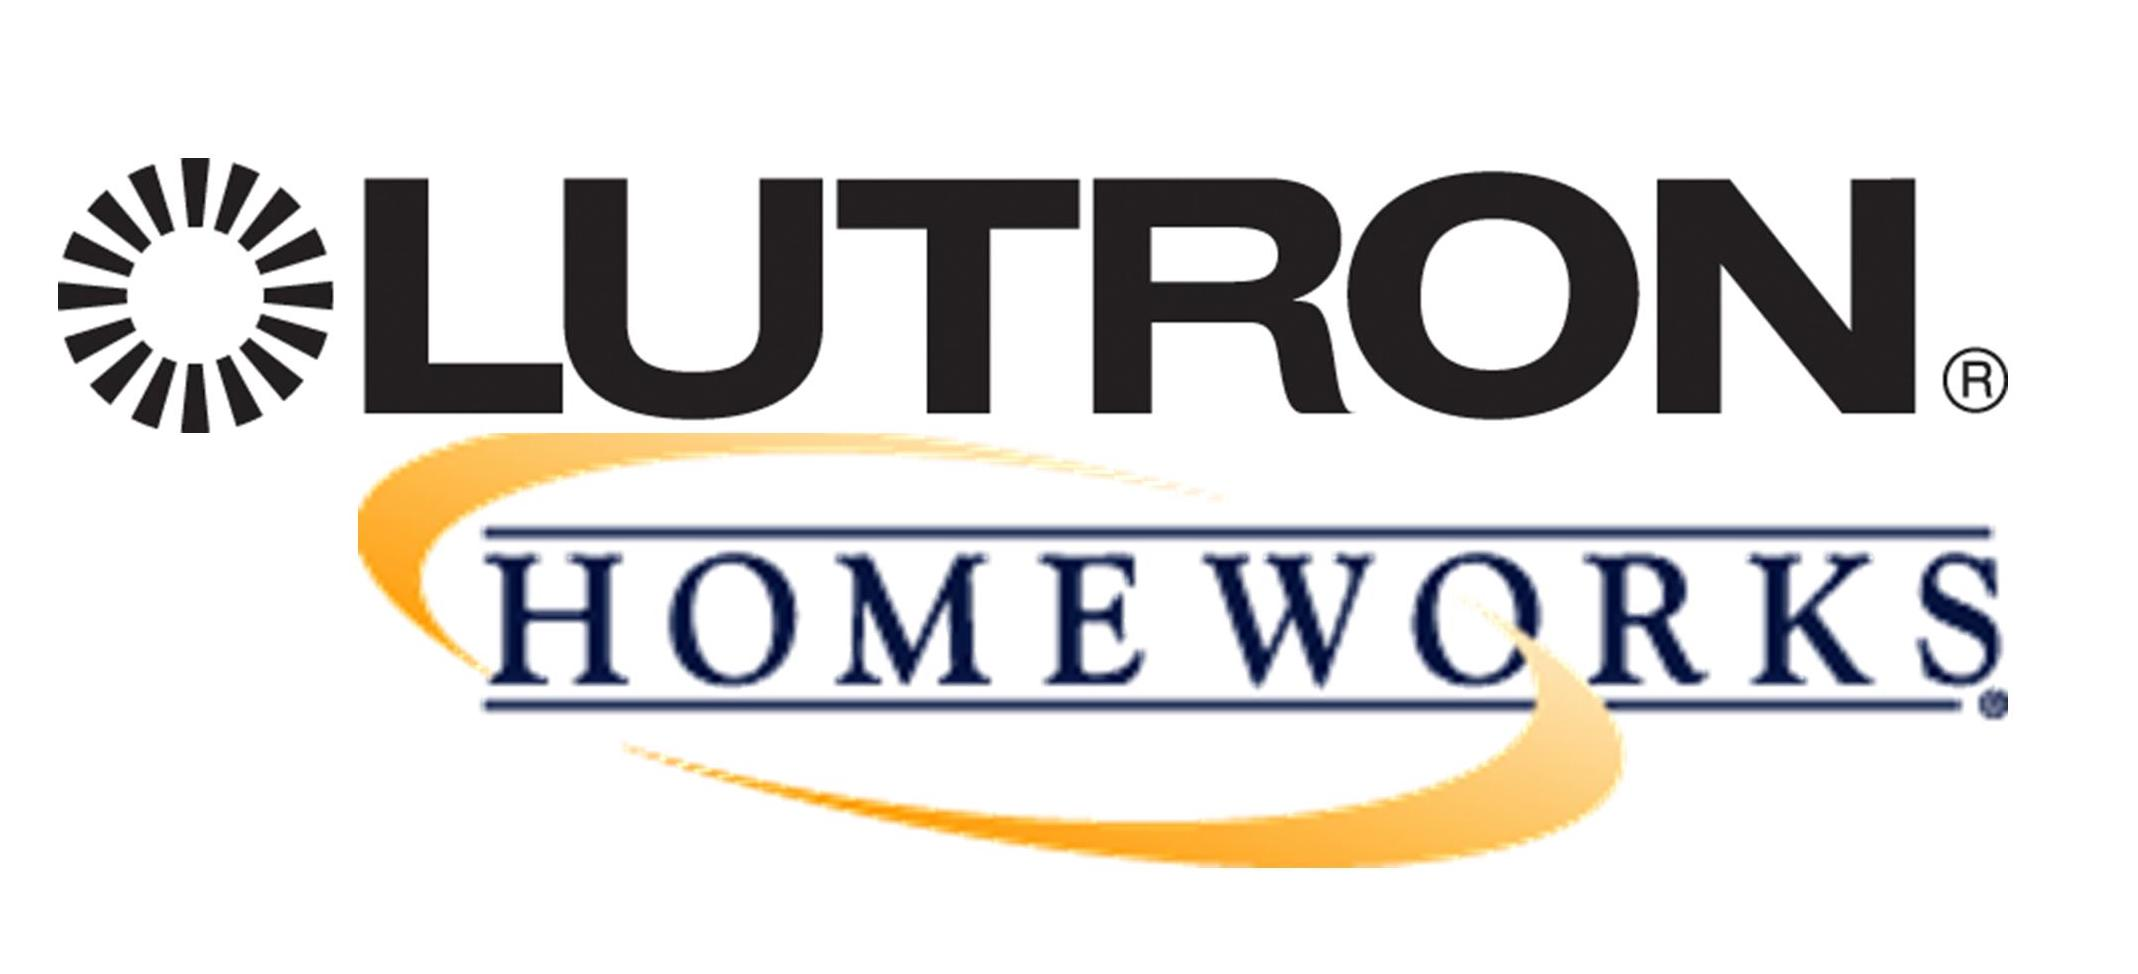 Lutron Homeworks Logos.jpeg